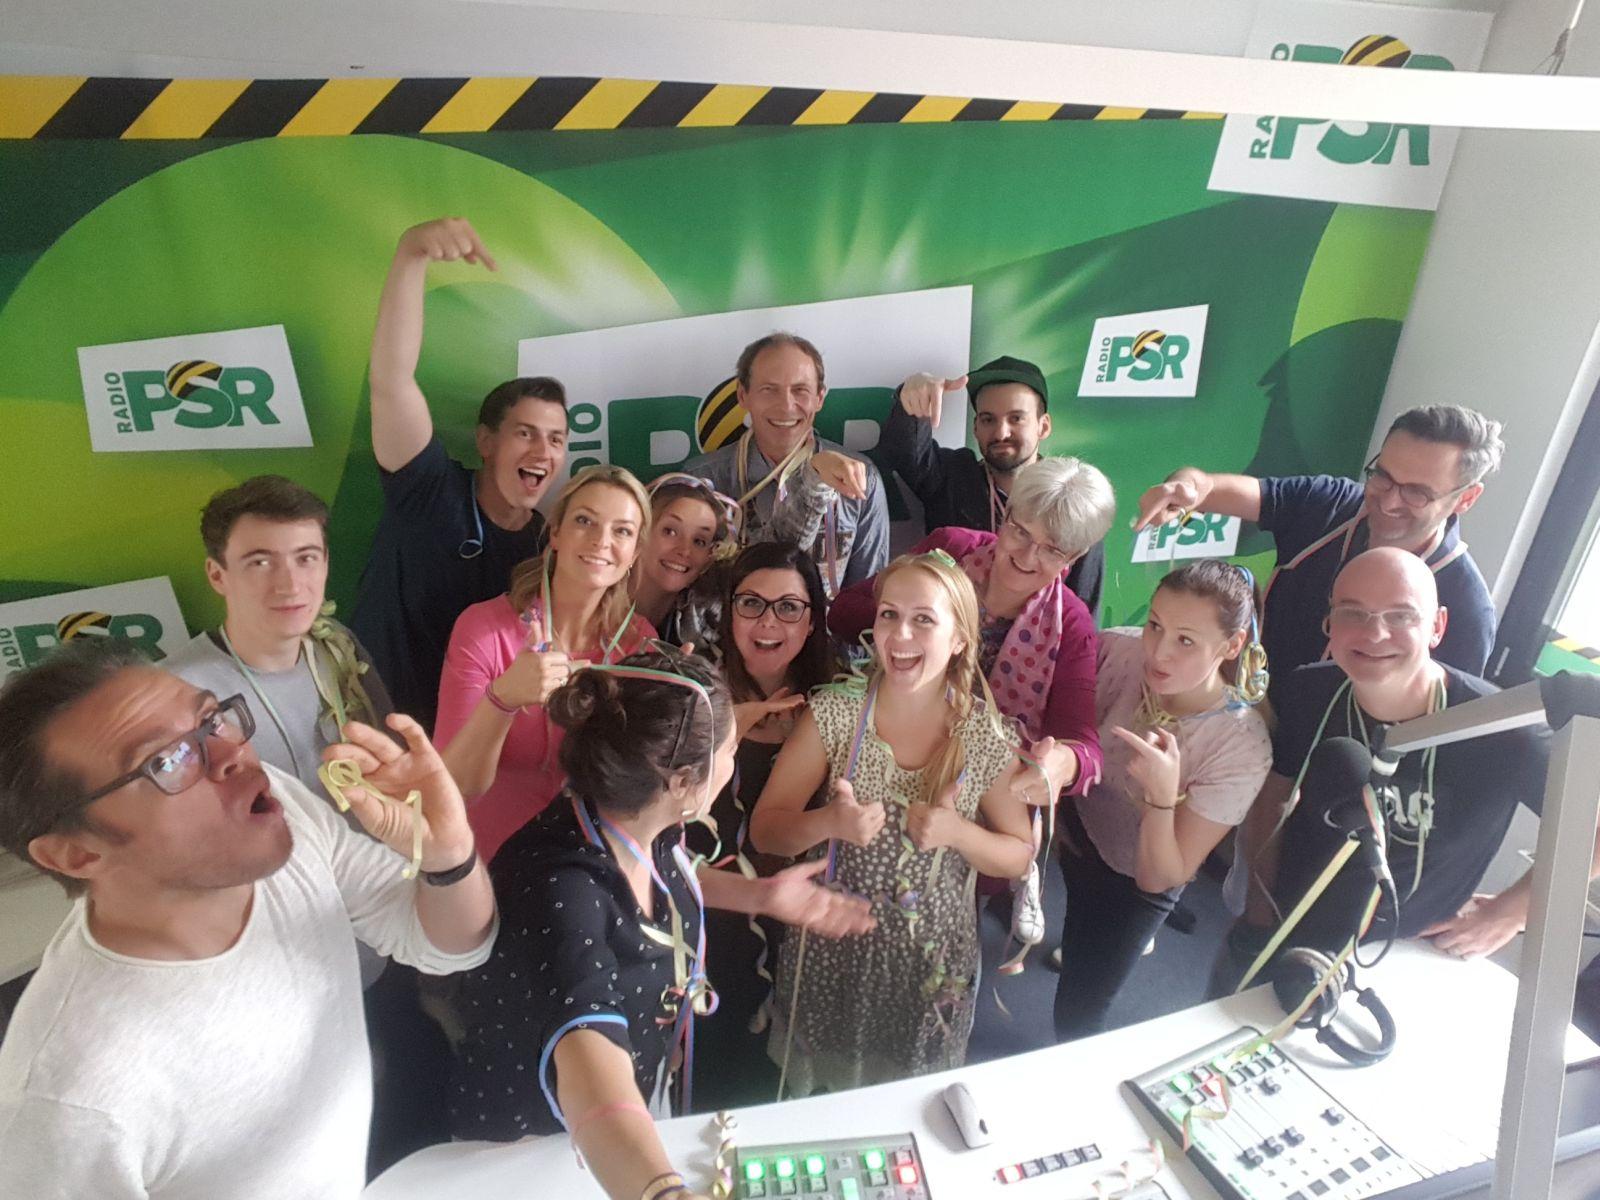 Radio psr partnersuche